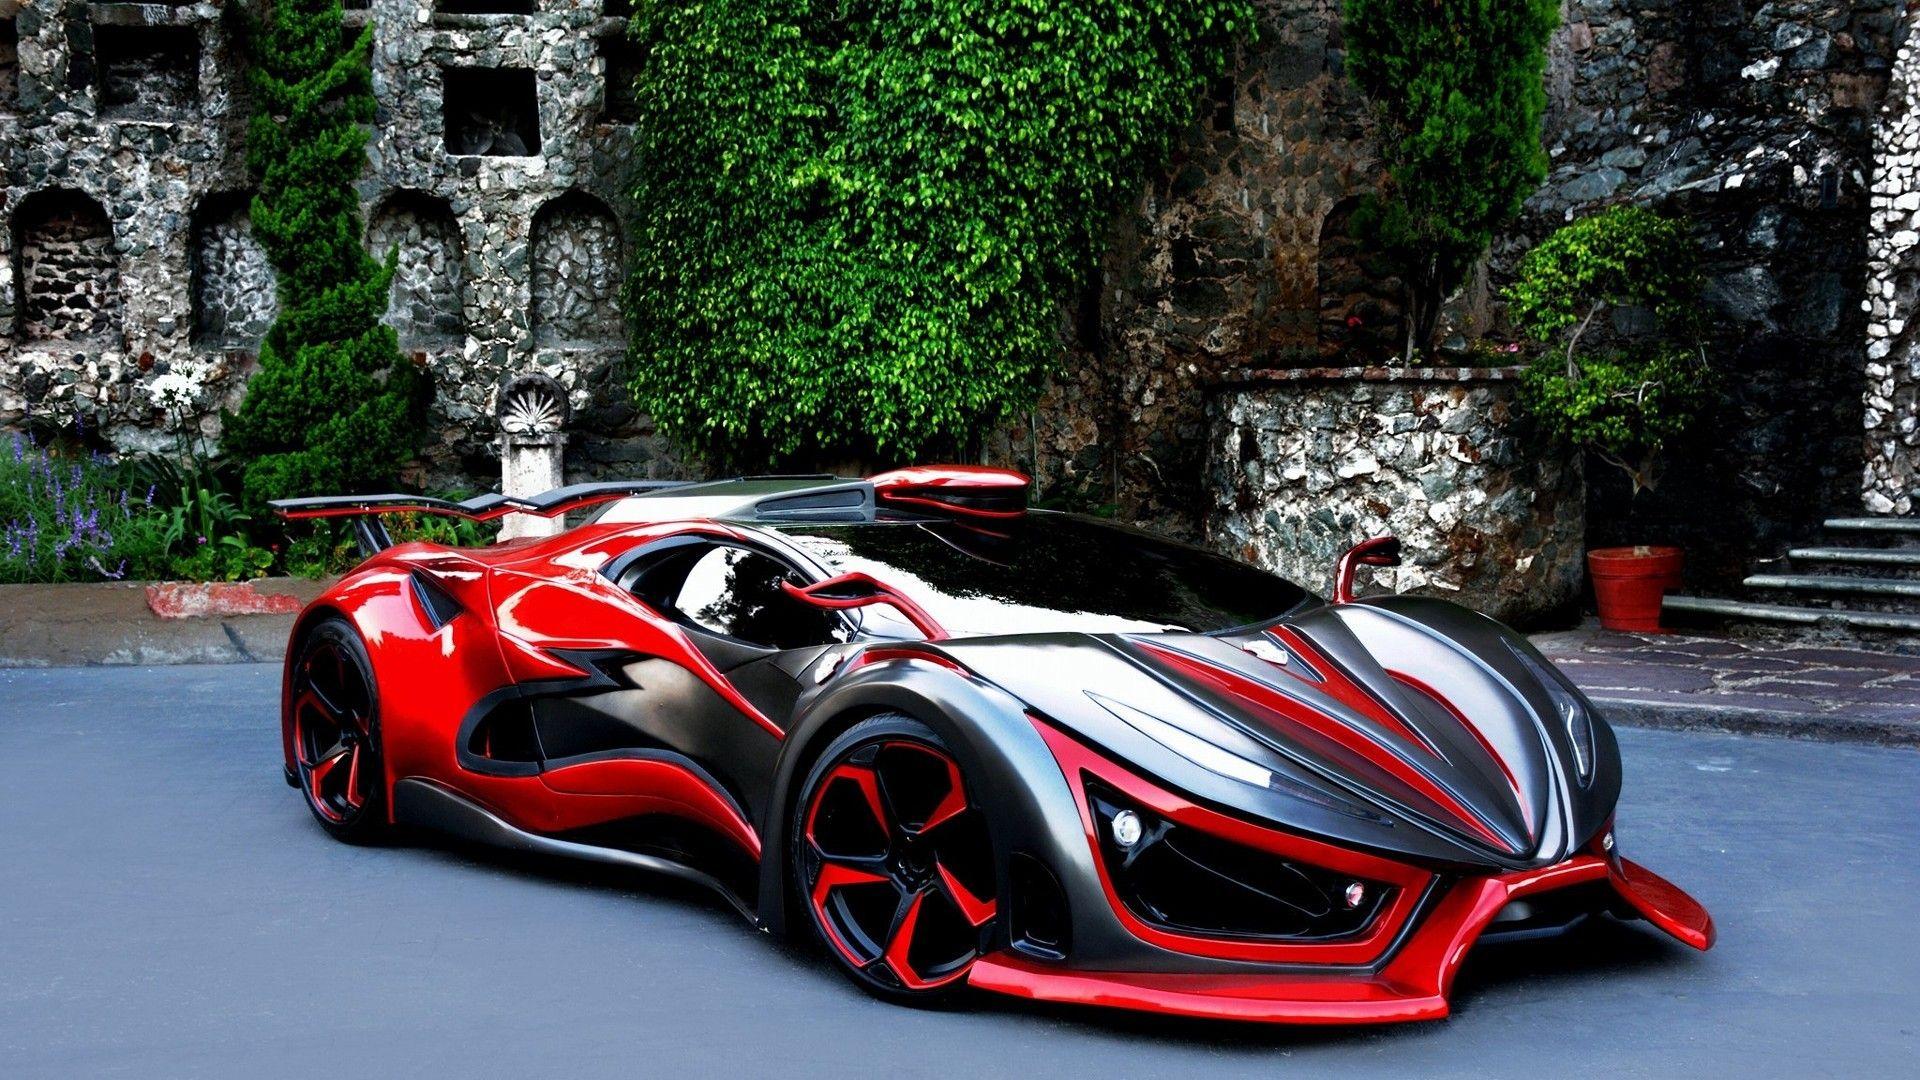 Inferno Exotic Car 2017 >> Inferno Exotic Car El Hiperauto Mexicano First Drive Mexico